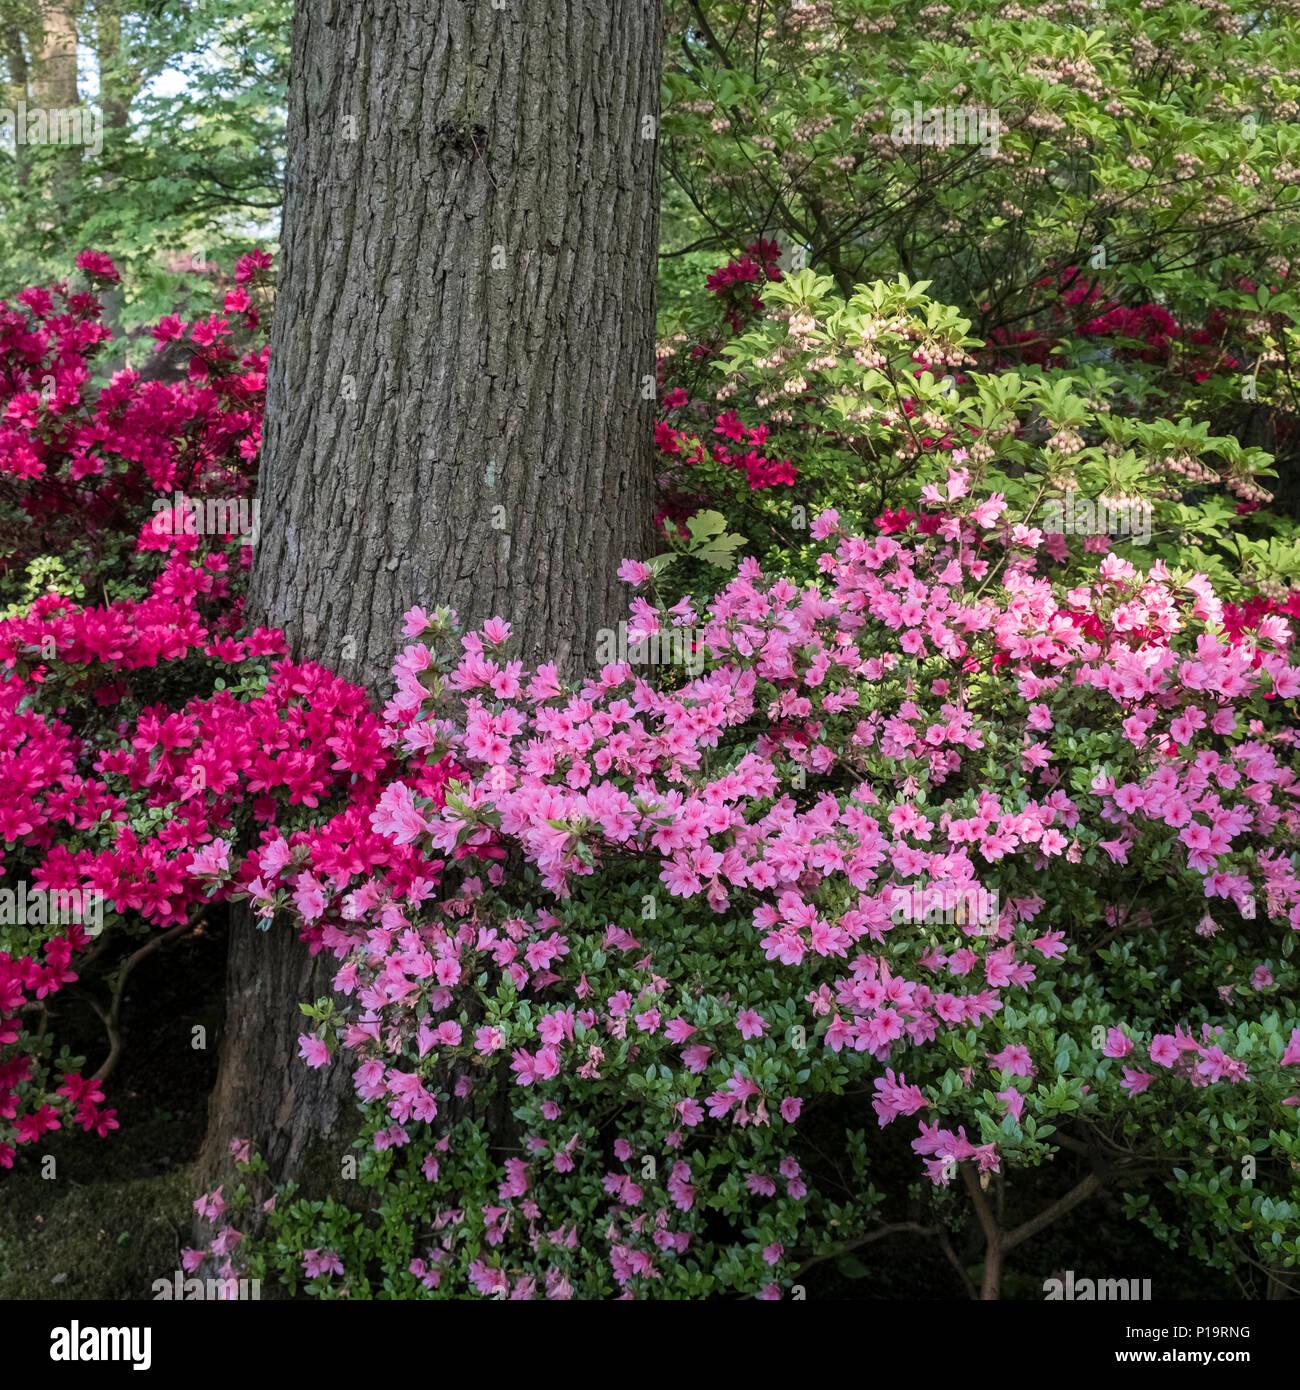 Colourful Azalea Shrubs In The Famous Japanese Garden (Japanse Tuin) In  Spring (May), Clingendael Park, The Hague (Den Haag), Netherlands.